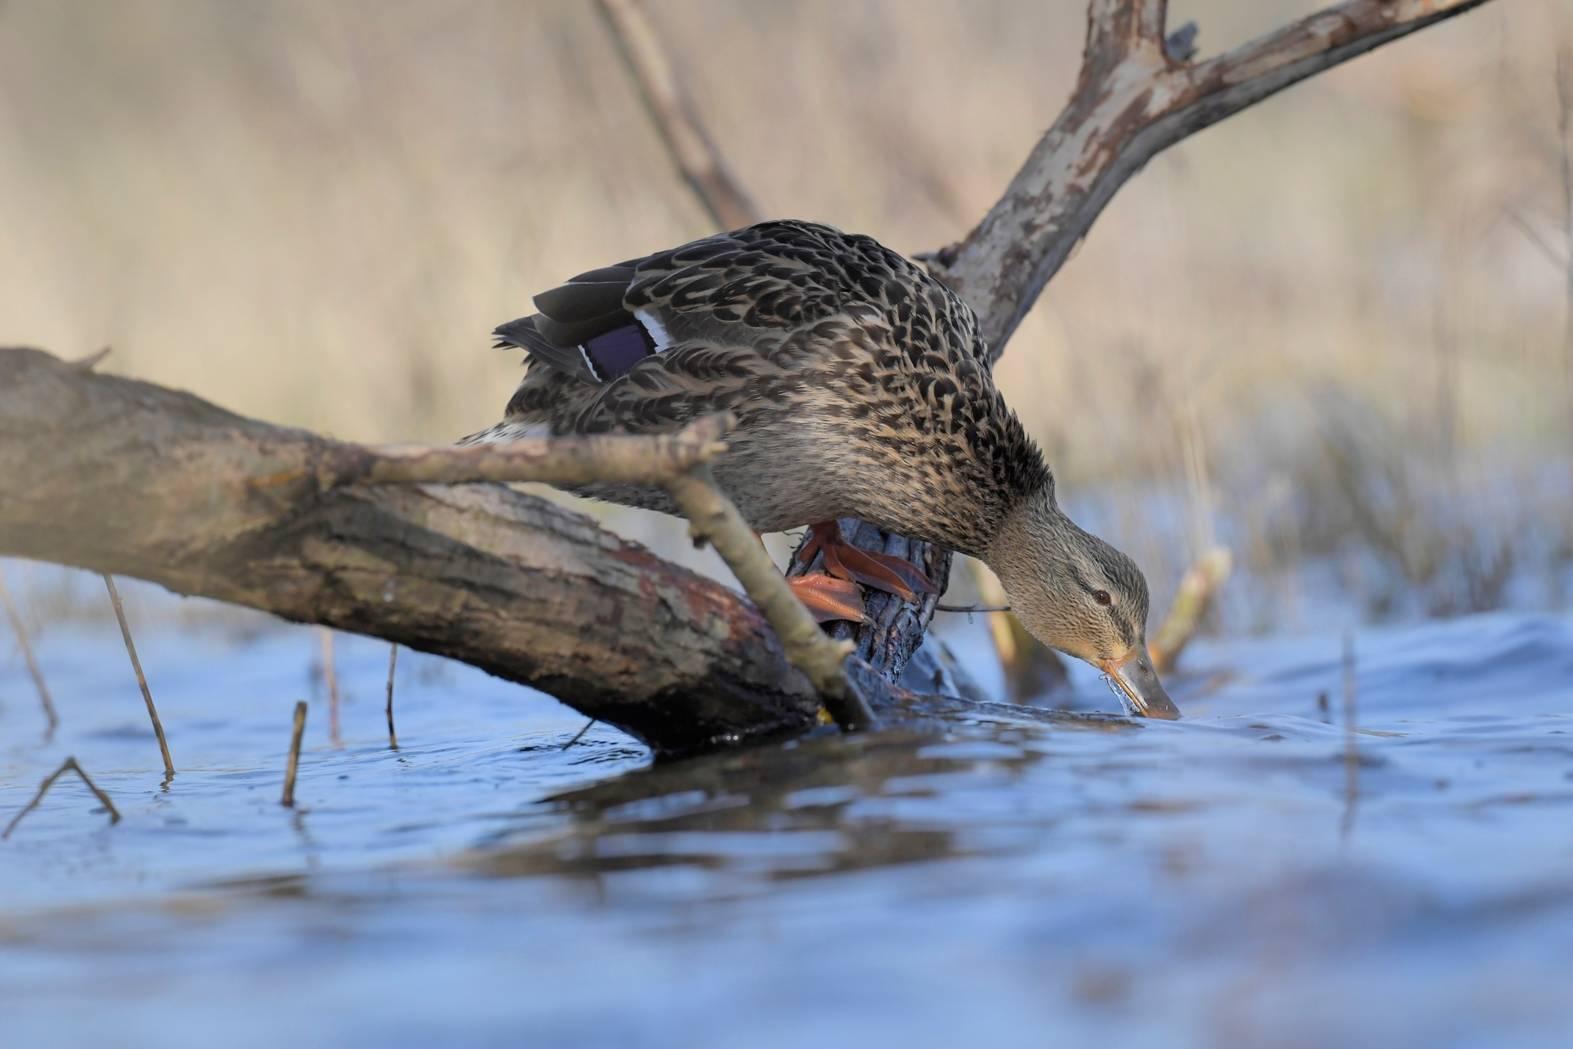 Cane - Female duck.